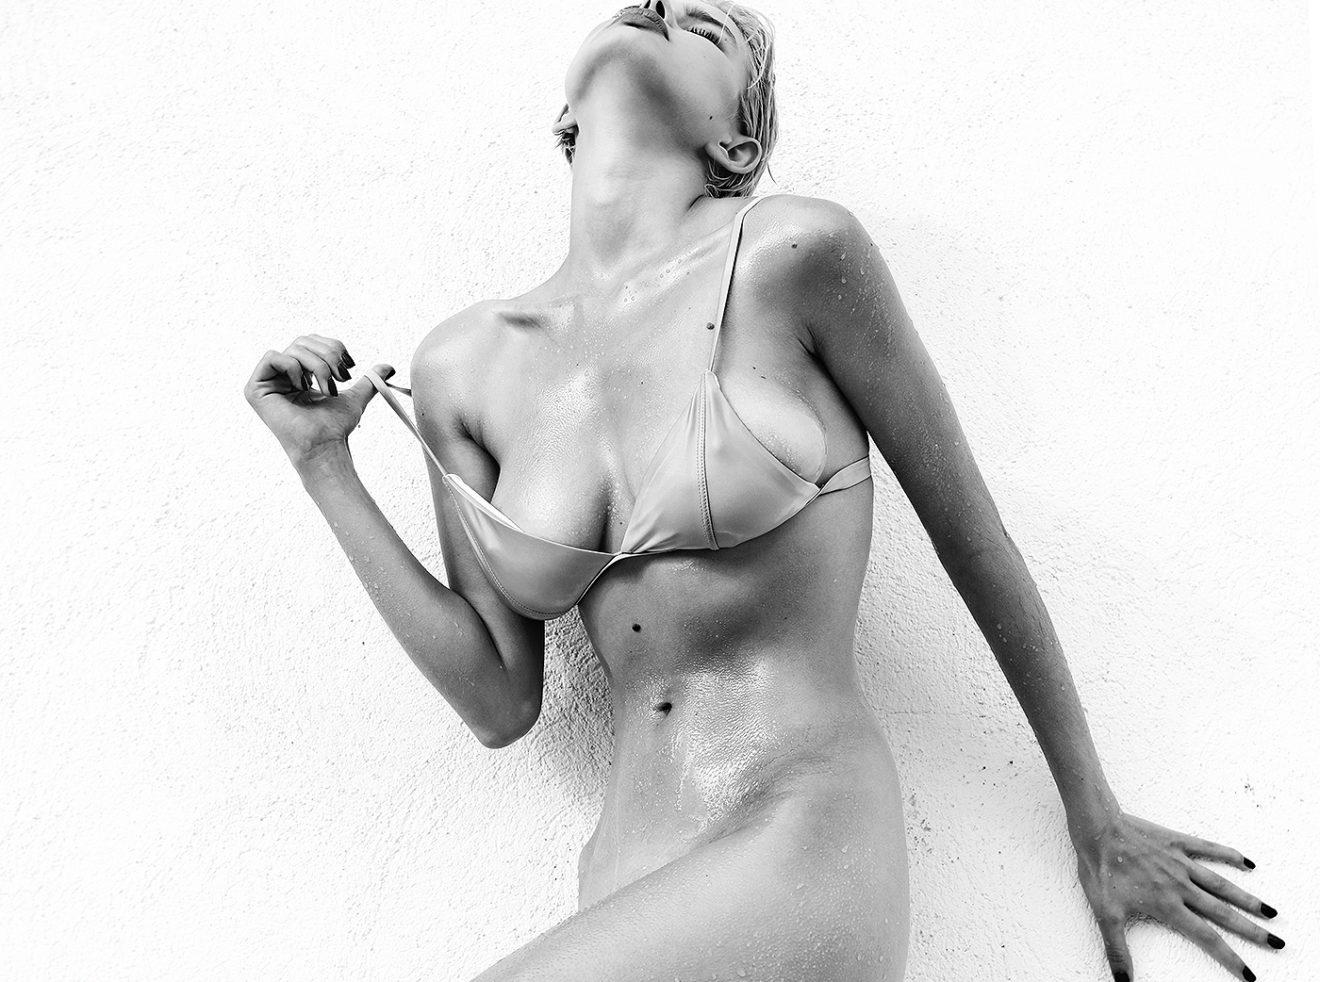 Playmate Julia Logacheva by Ana Dias for Playboy